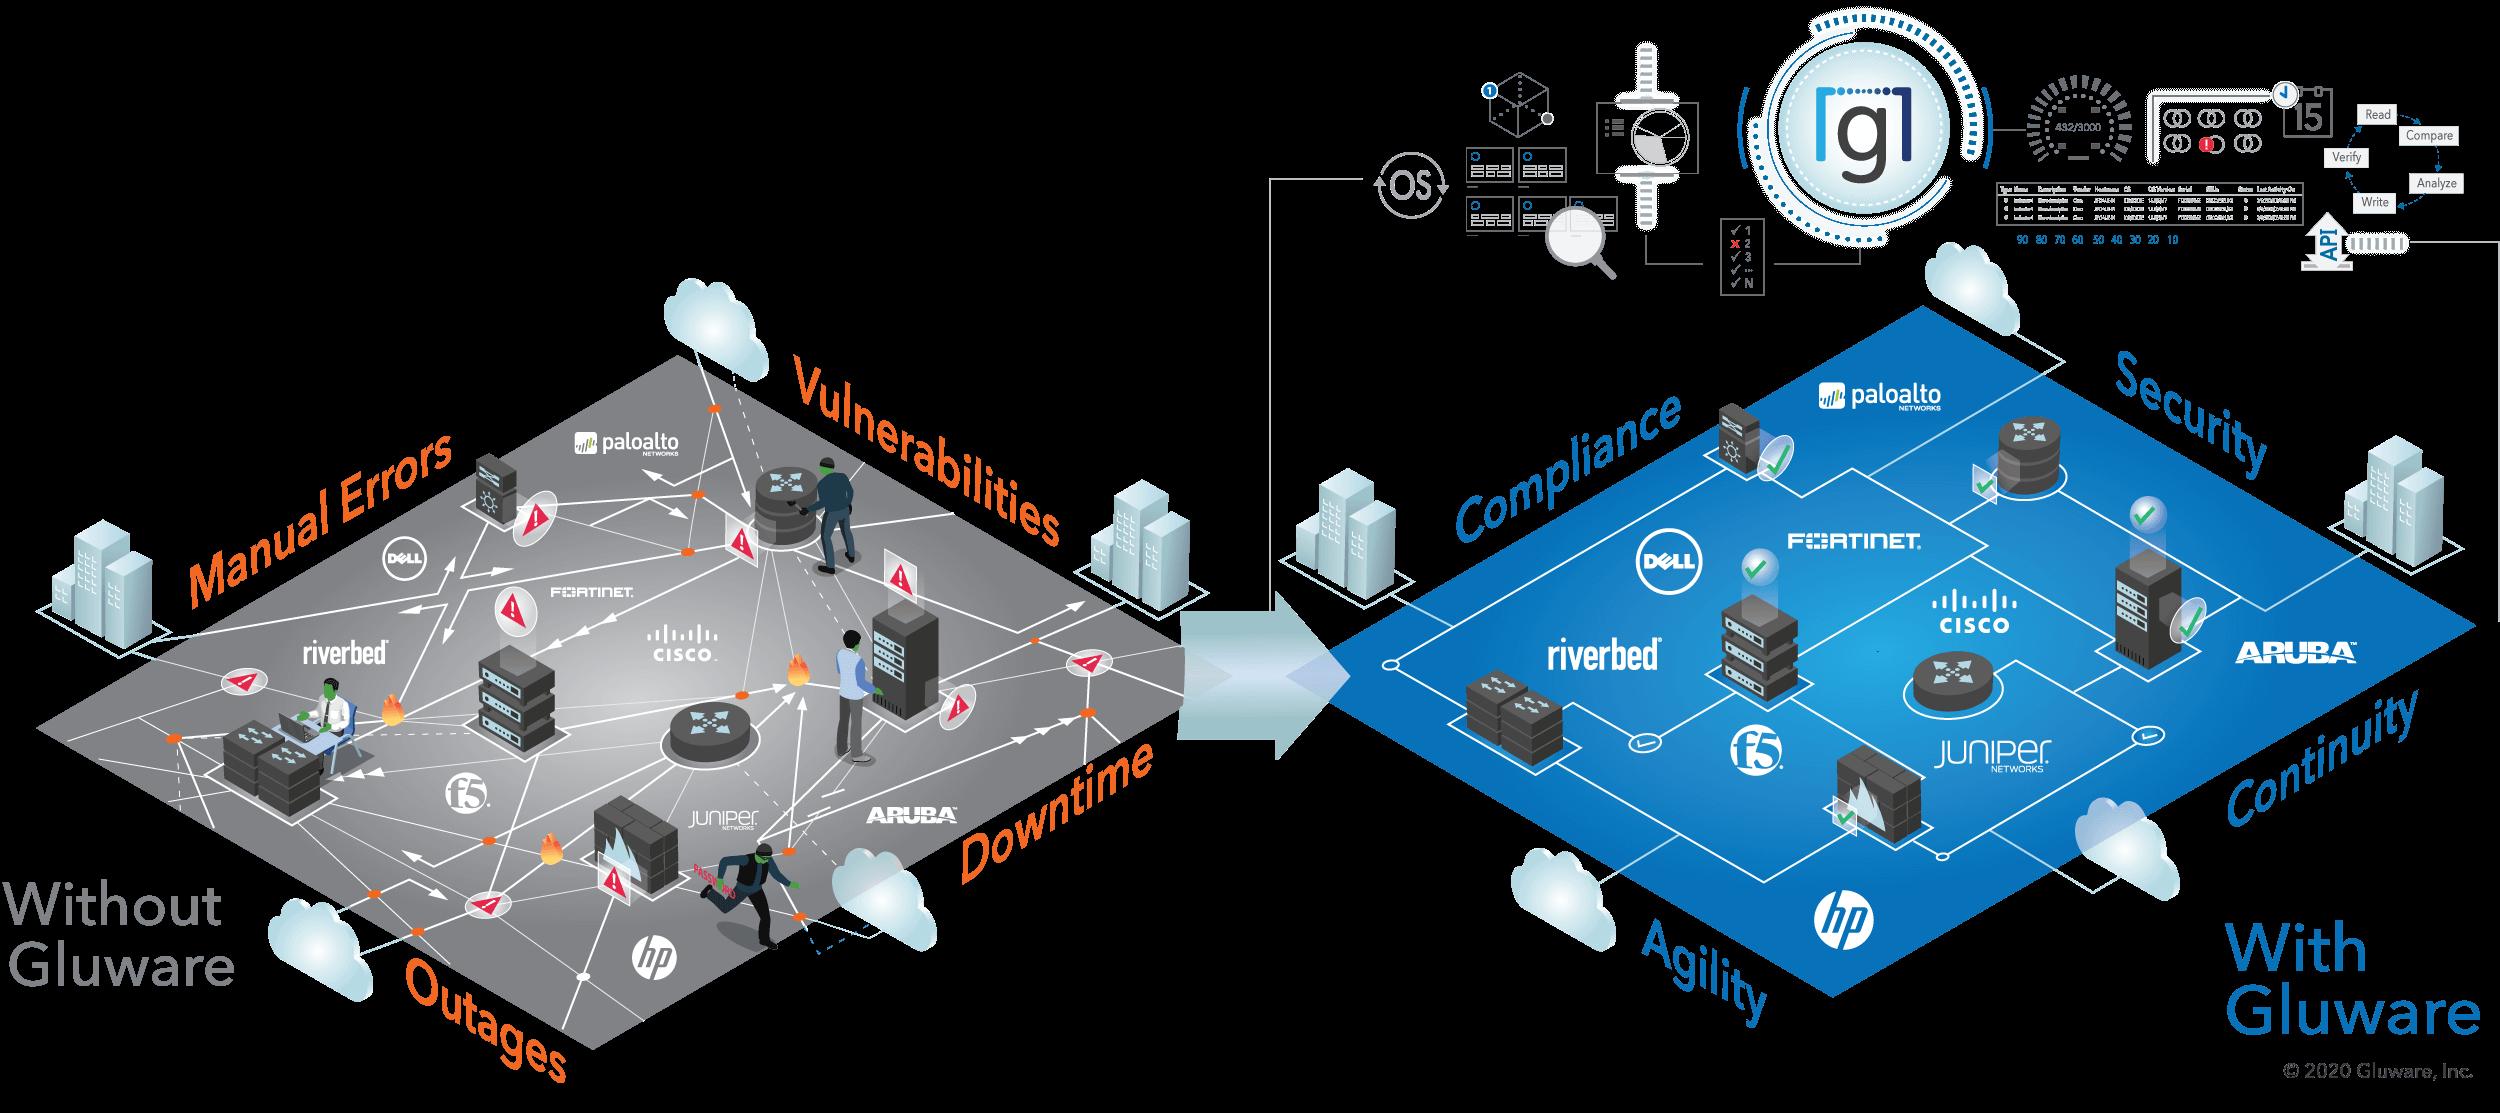 Network Automation diagram